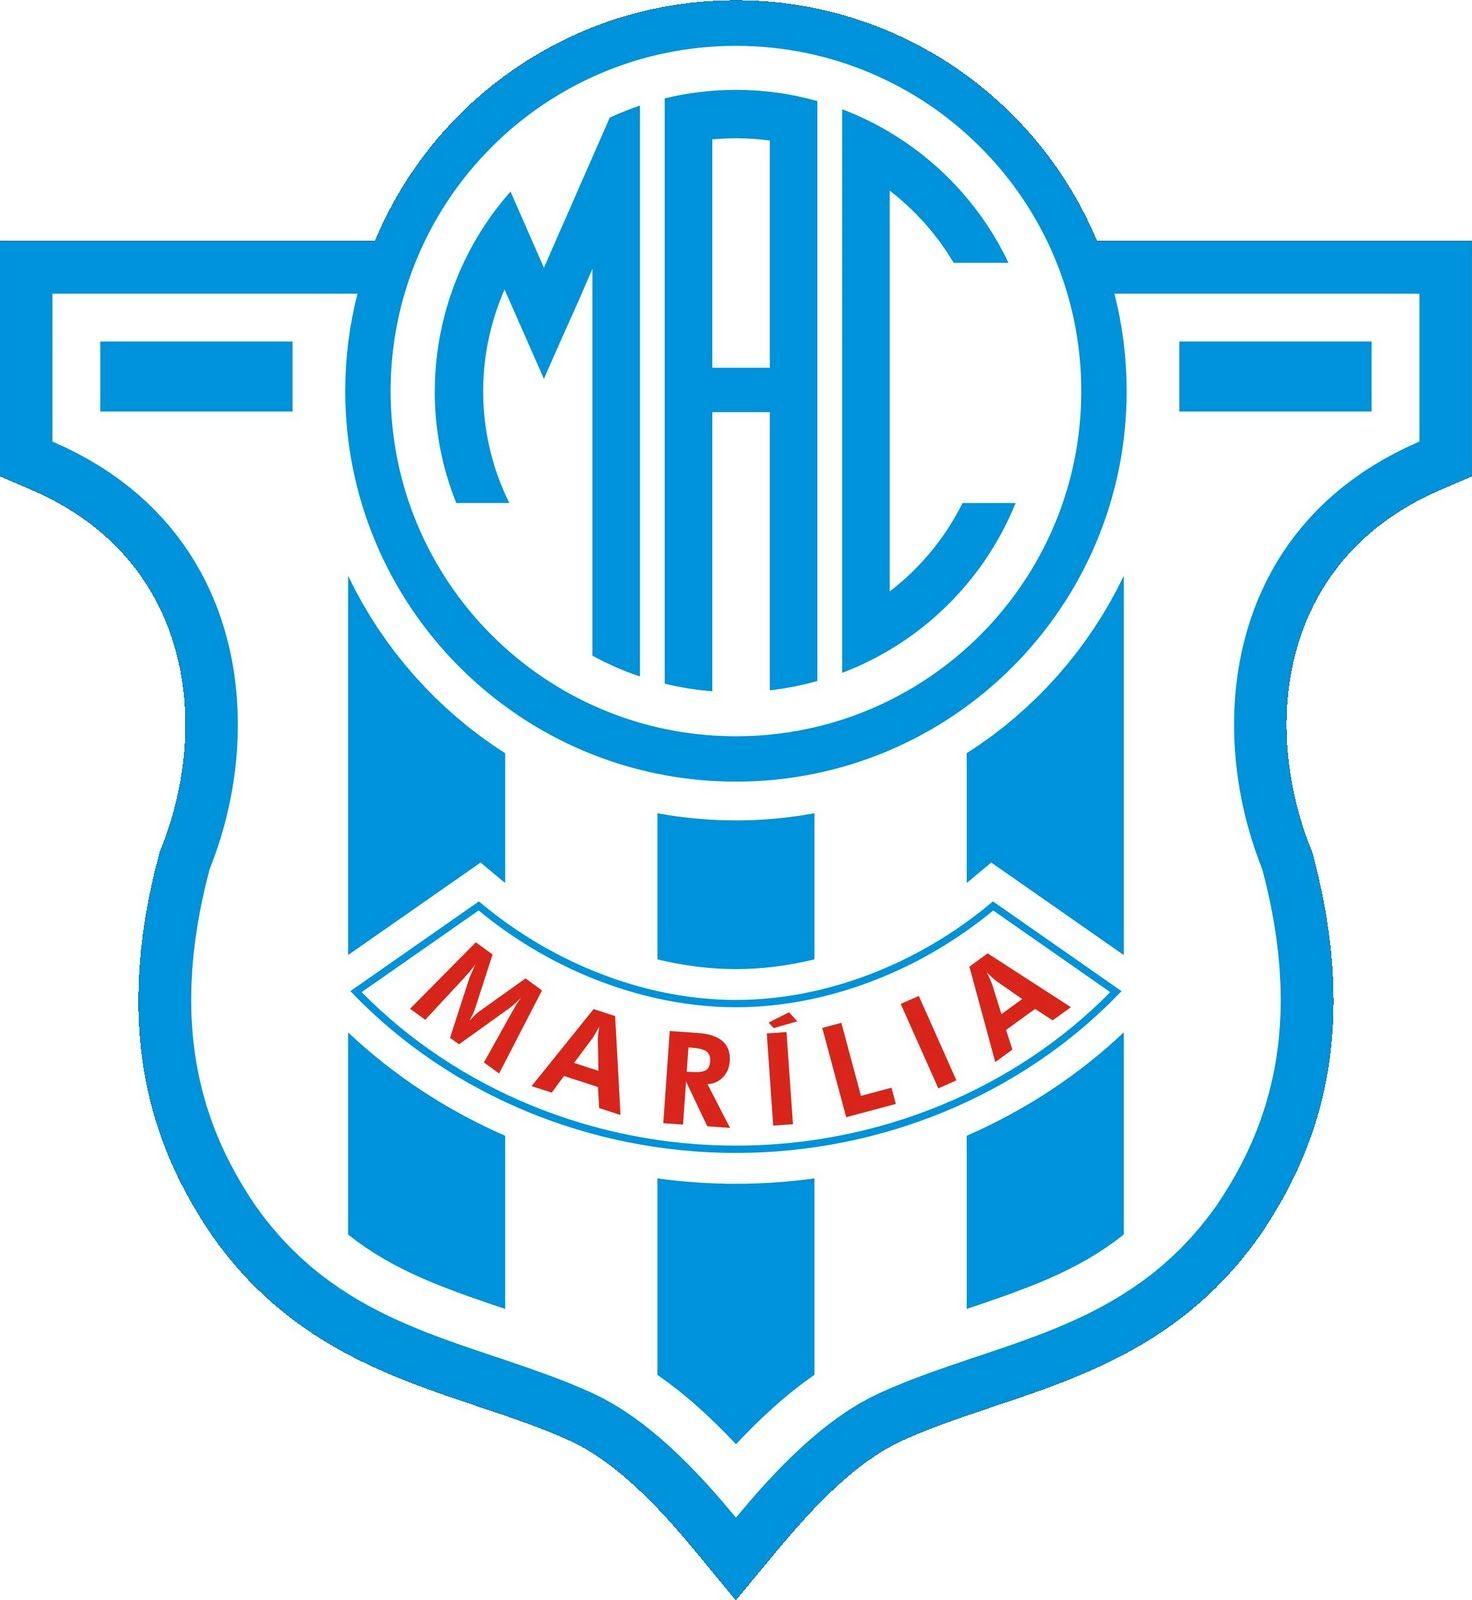 Marilia Escudos De Futebol Escudo Futebol